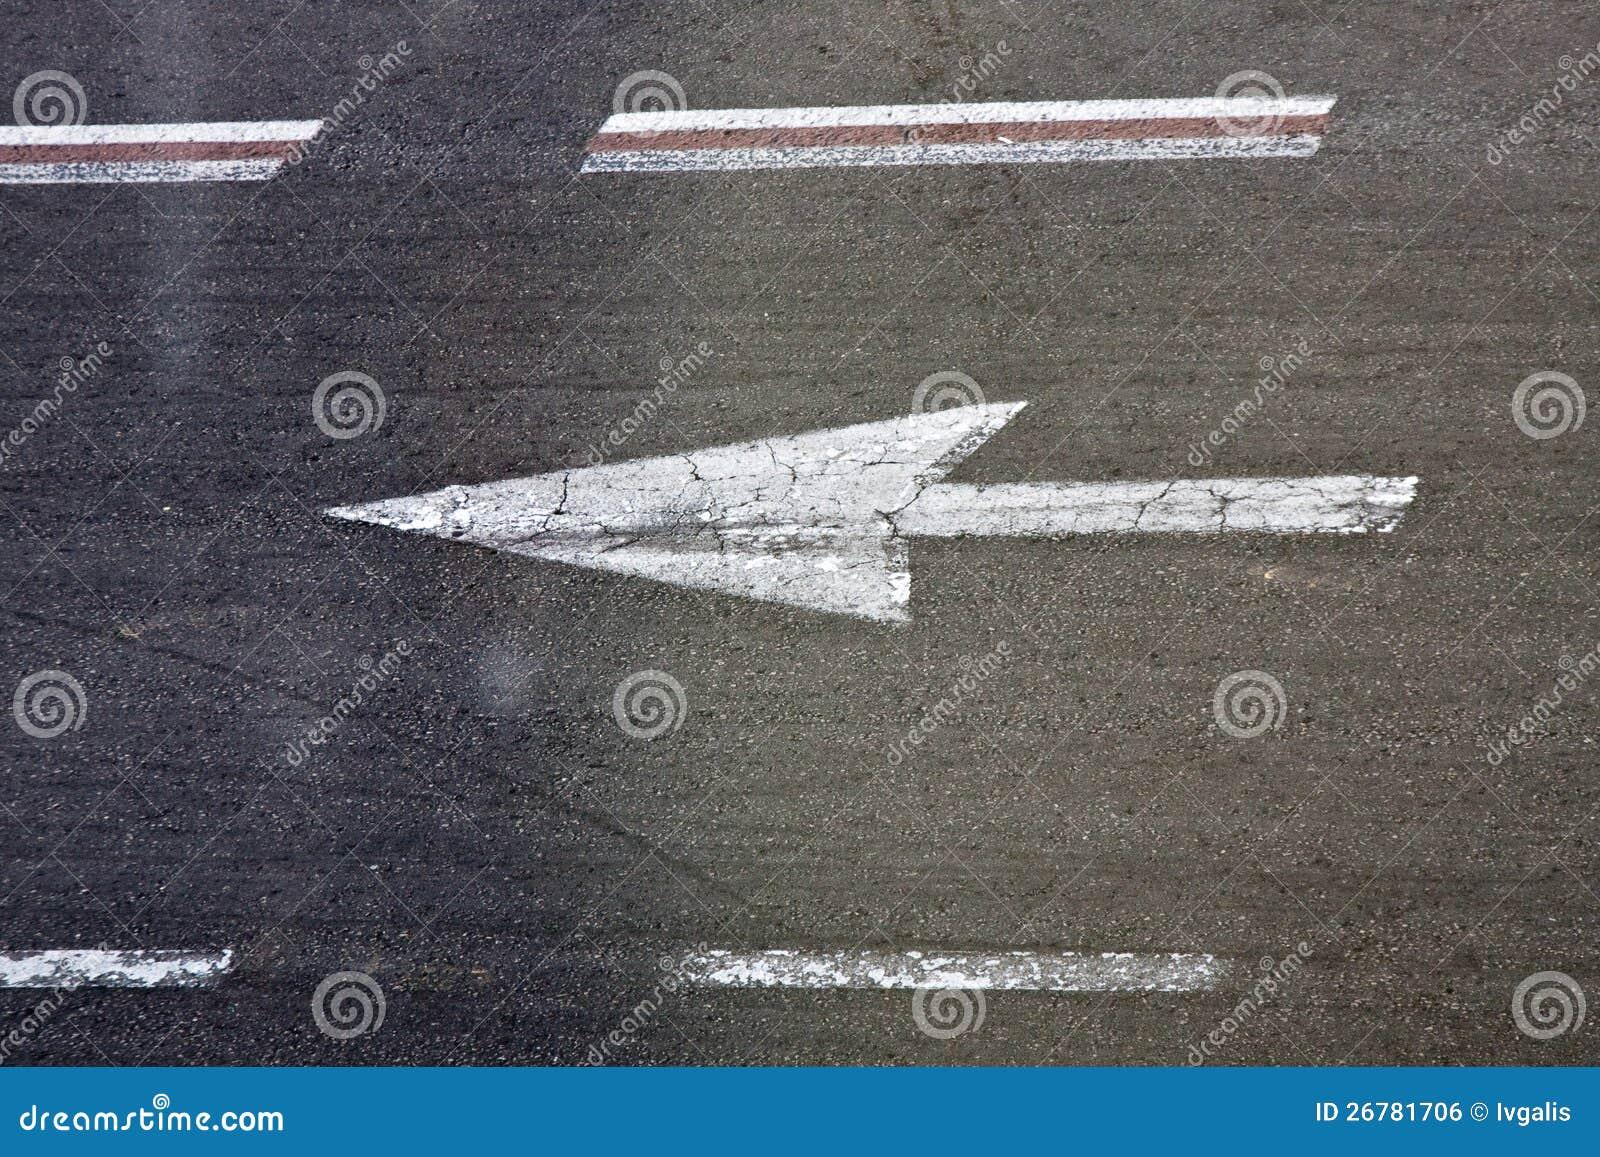 Road Marking Royalty Free Stock Image - Image: 26781706